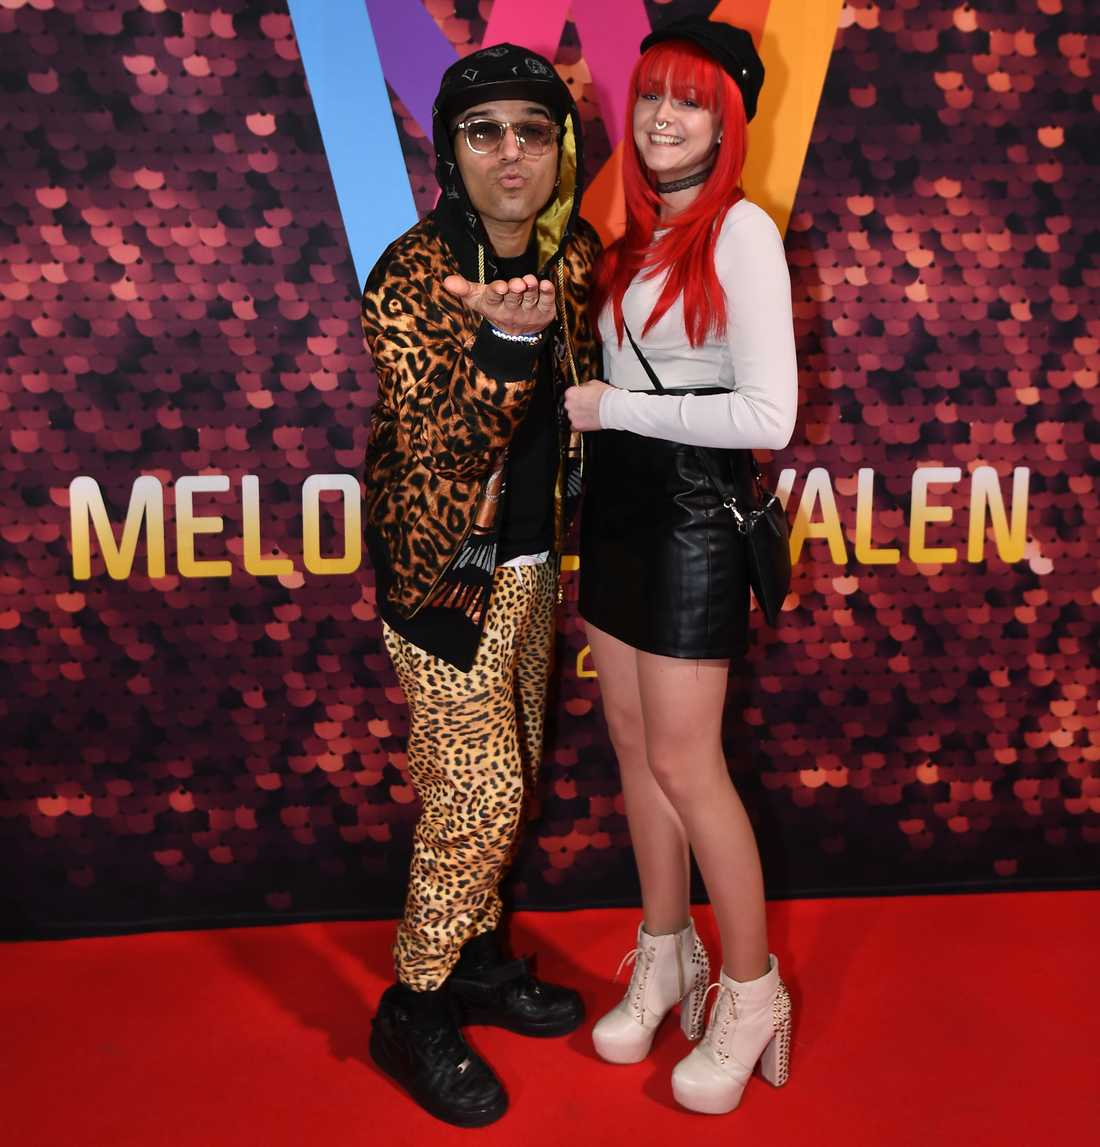 Sean Banan med nya kärleken Gina på Melodifestivalens efterfest på Berns i Stockholm 2020